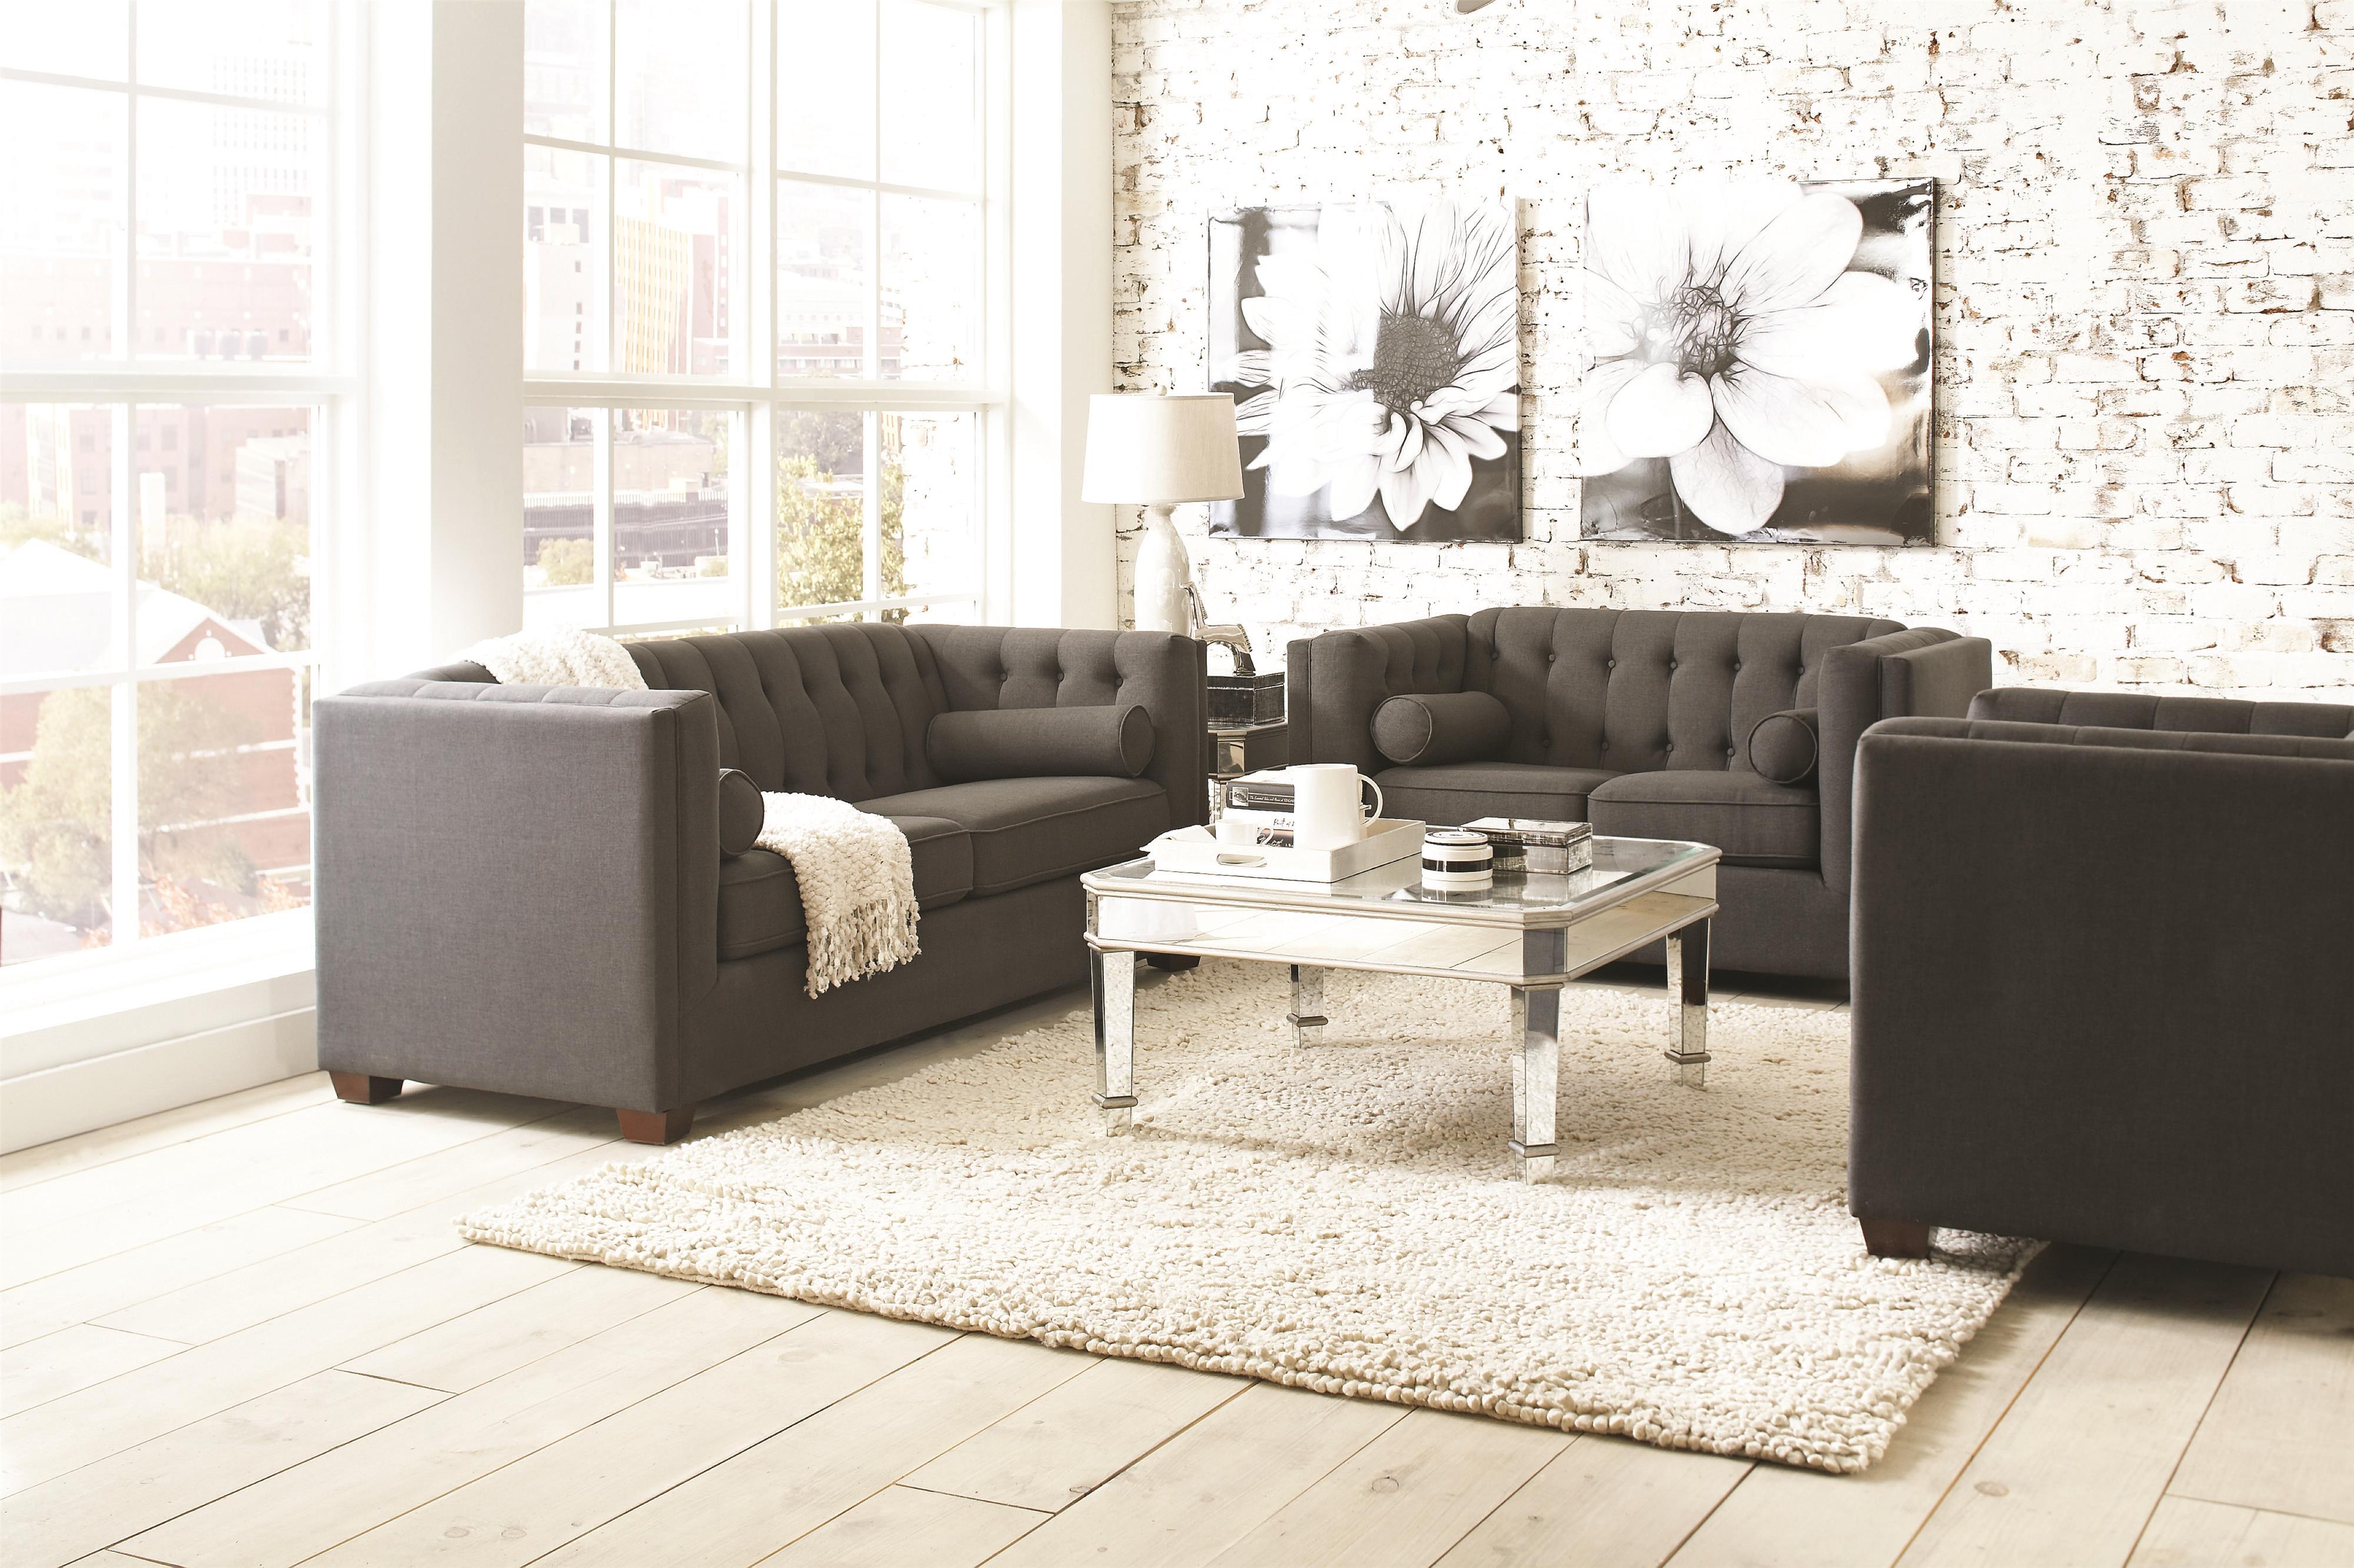 Coaster Cairns 504901 Sofa | Northeast Factory Direct | Sofas Cleveland,  Eastlake, Westlake, Mentor, Medina, Ohio